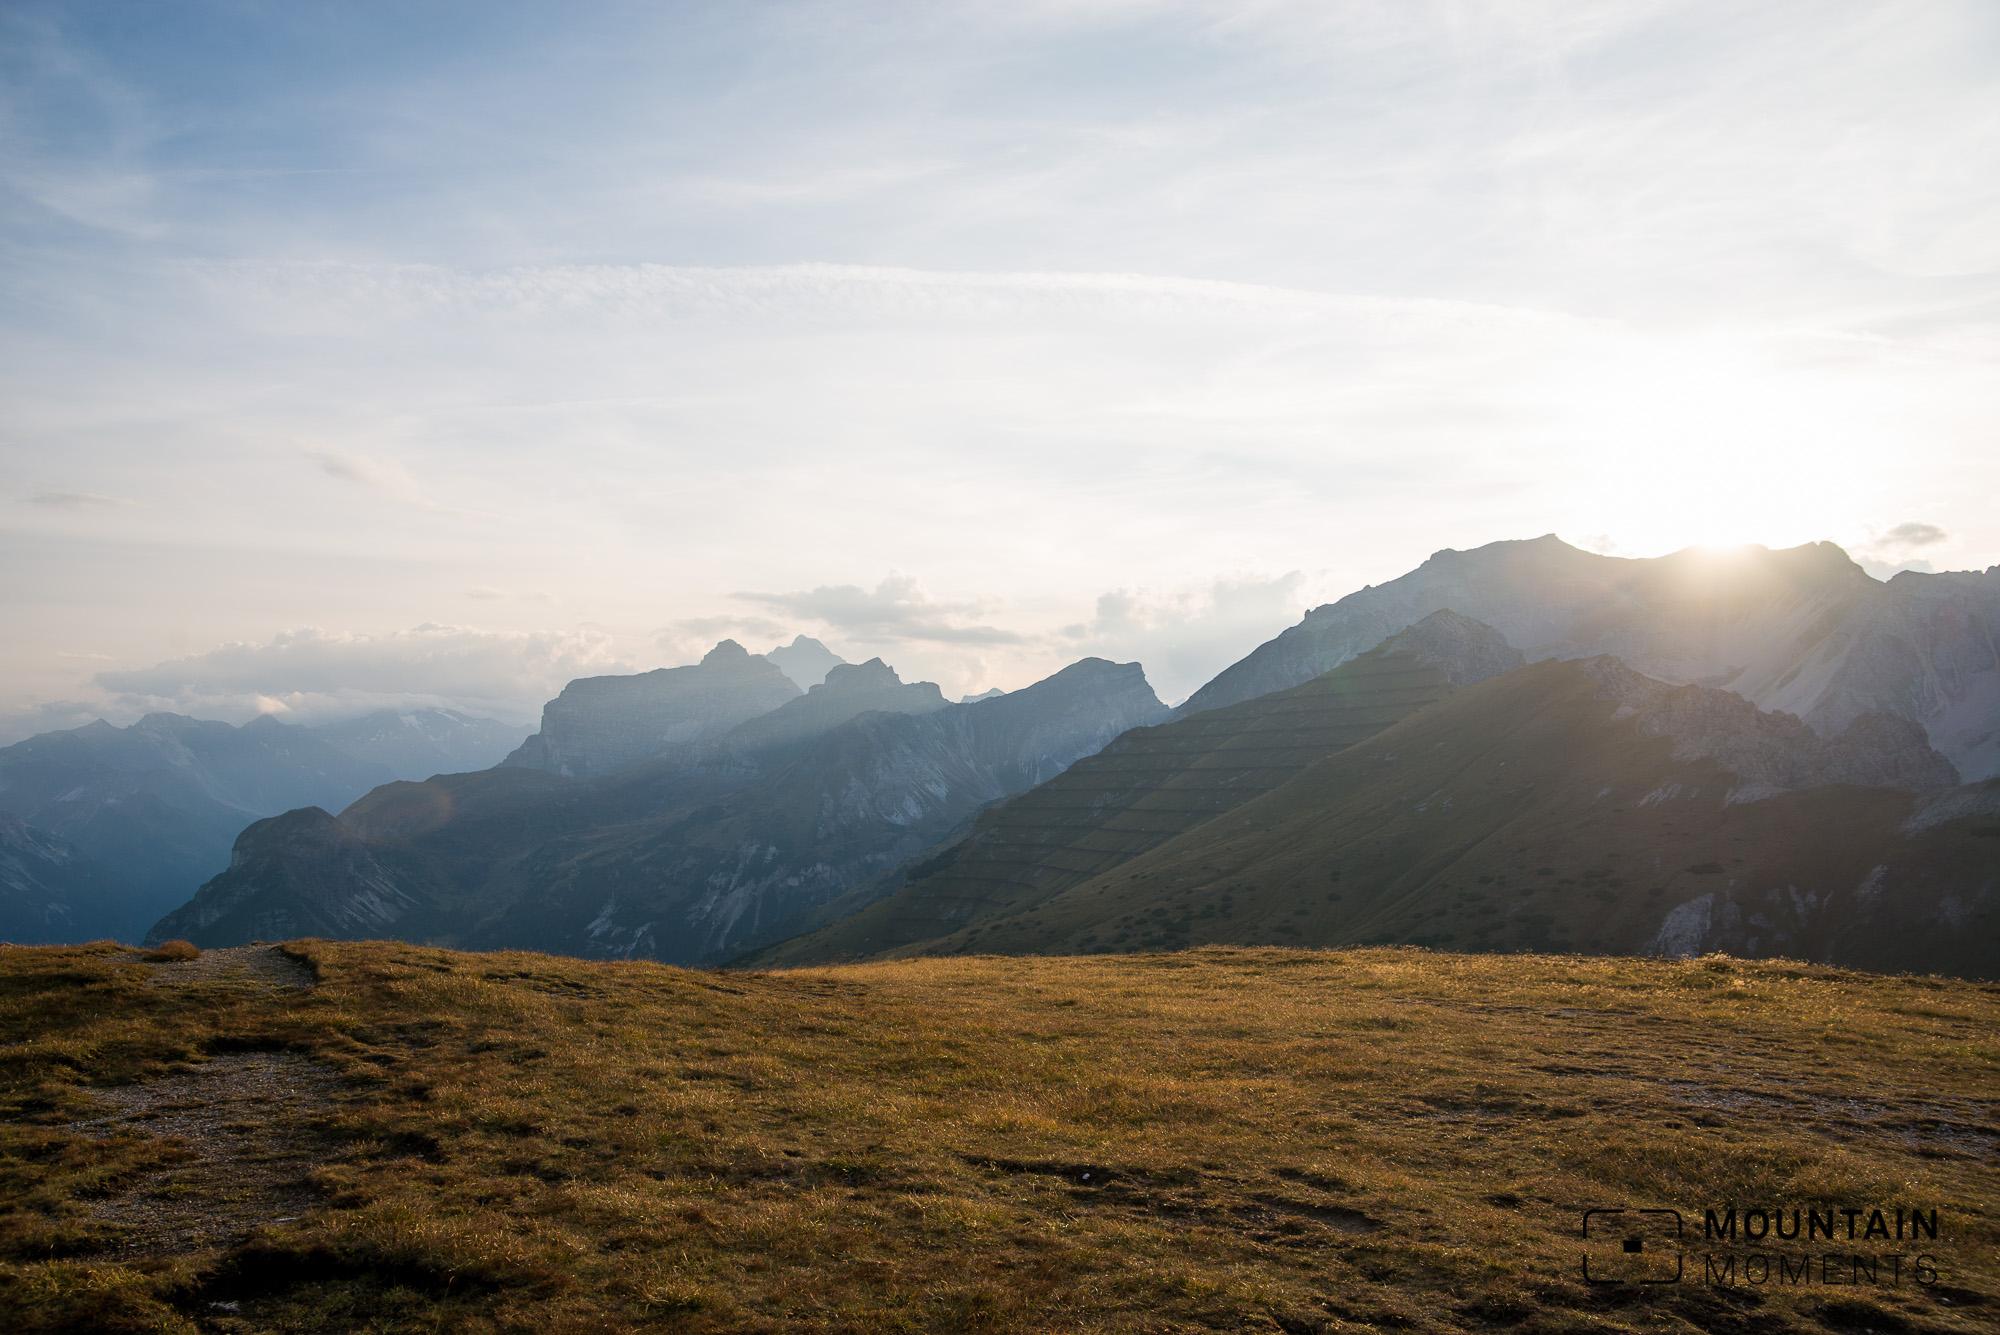 wandern wipptal, hiking wipptal, hiking brenner, bergtour brenner, fototipp tirol, fototipp wipptal, fototipp brenner, wanderung blaser, bergwanderung gschnitz, fototour tirol, fotoworkshop, landschaftsfotografie tirol